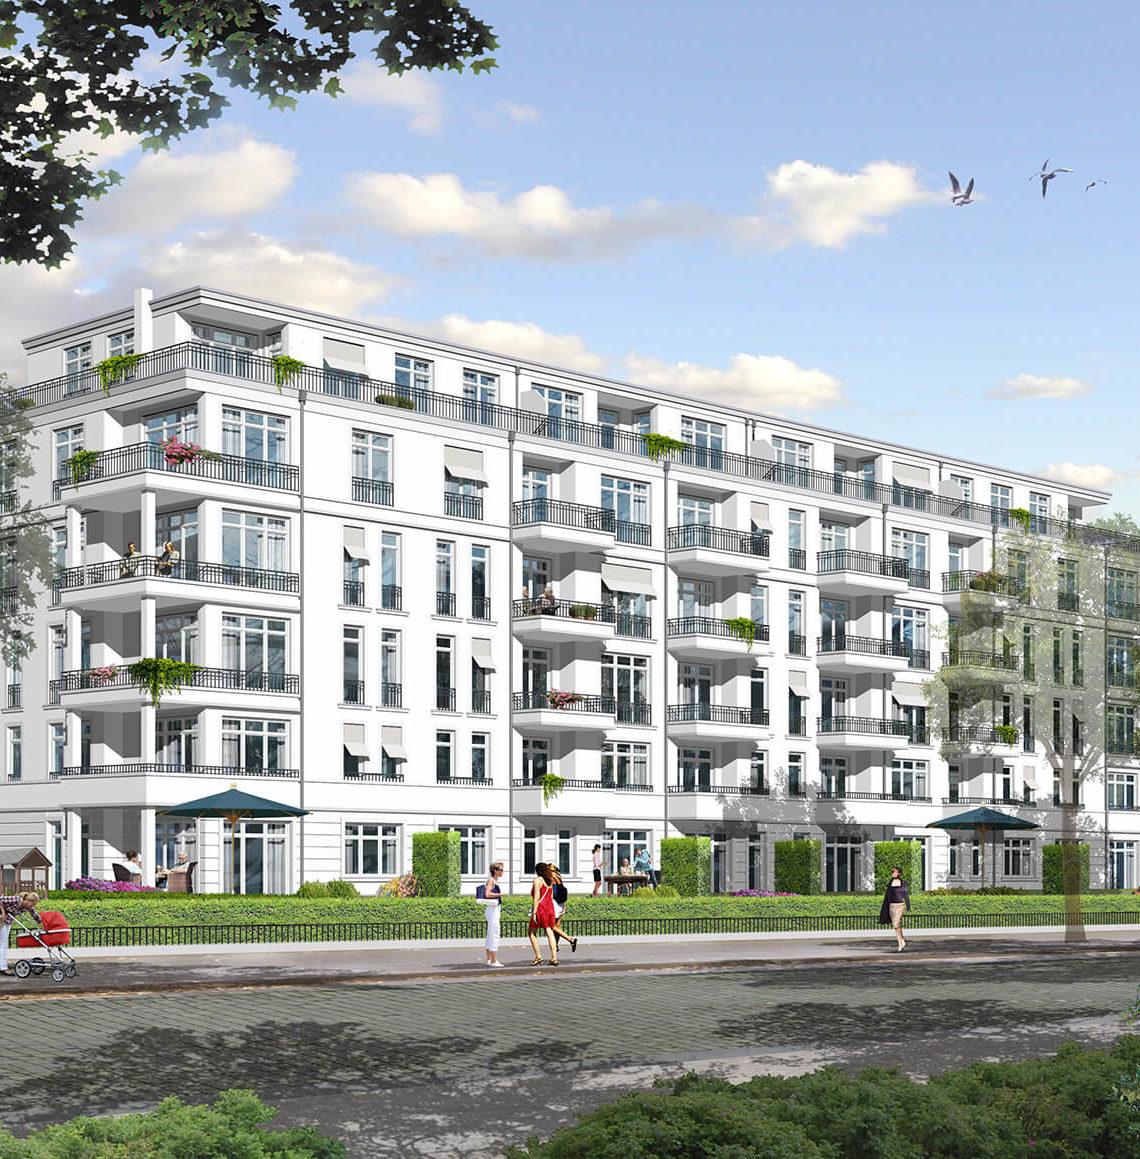 Wohnungsbauprojekt Brehme-Palais